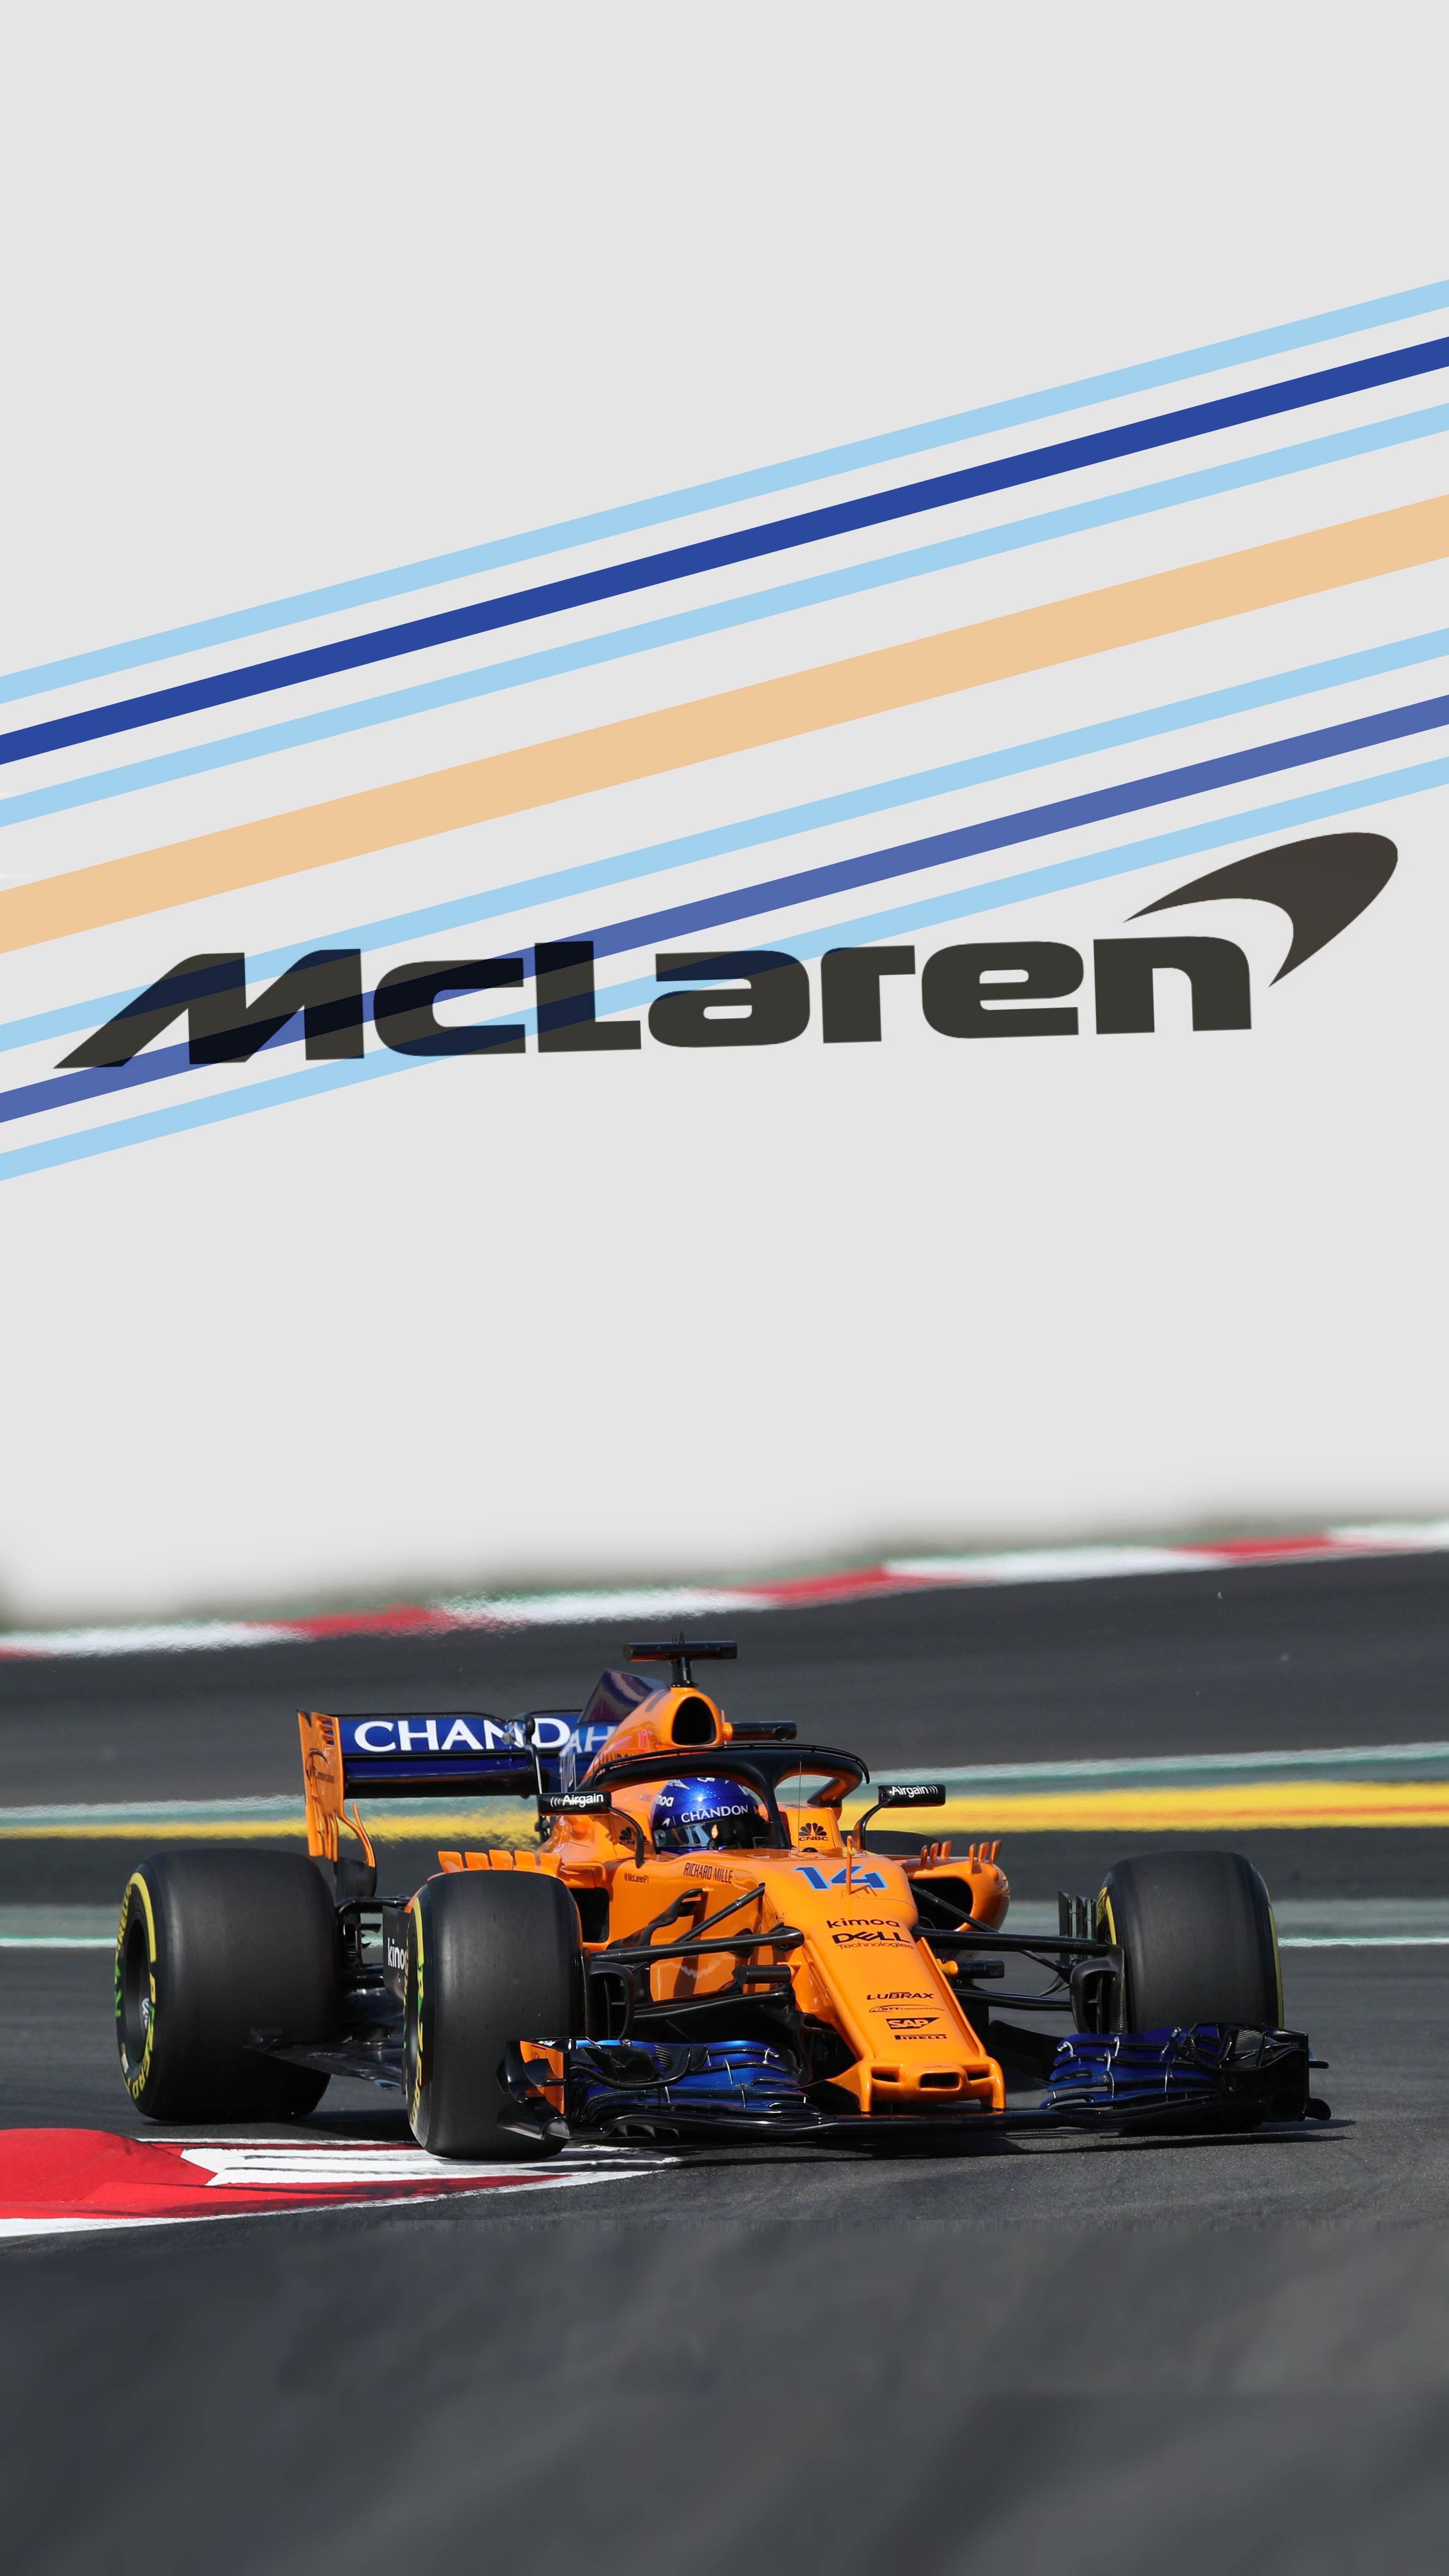 Mclaren Formula 1 2019 Wallpaper 3150x5600